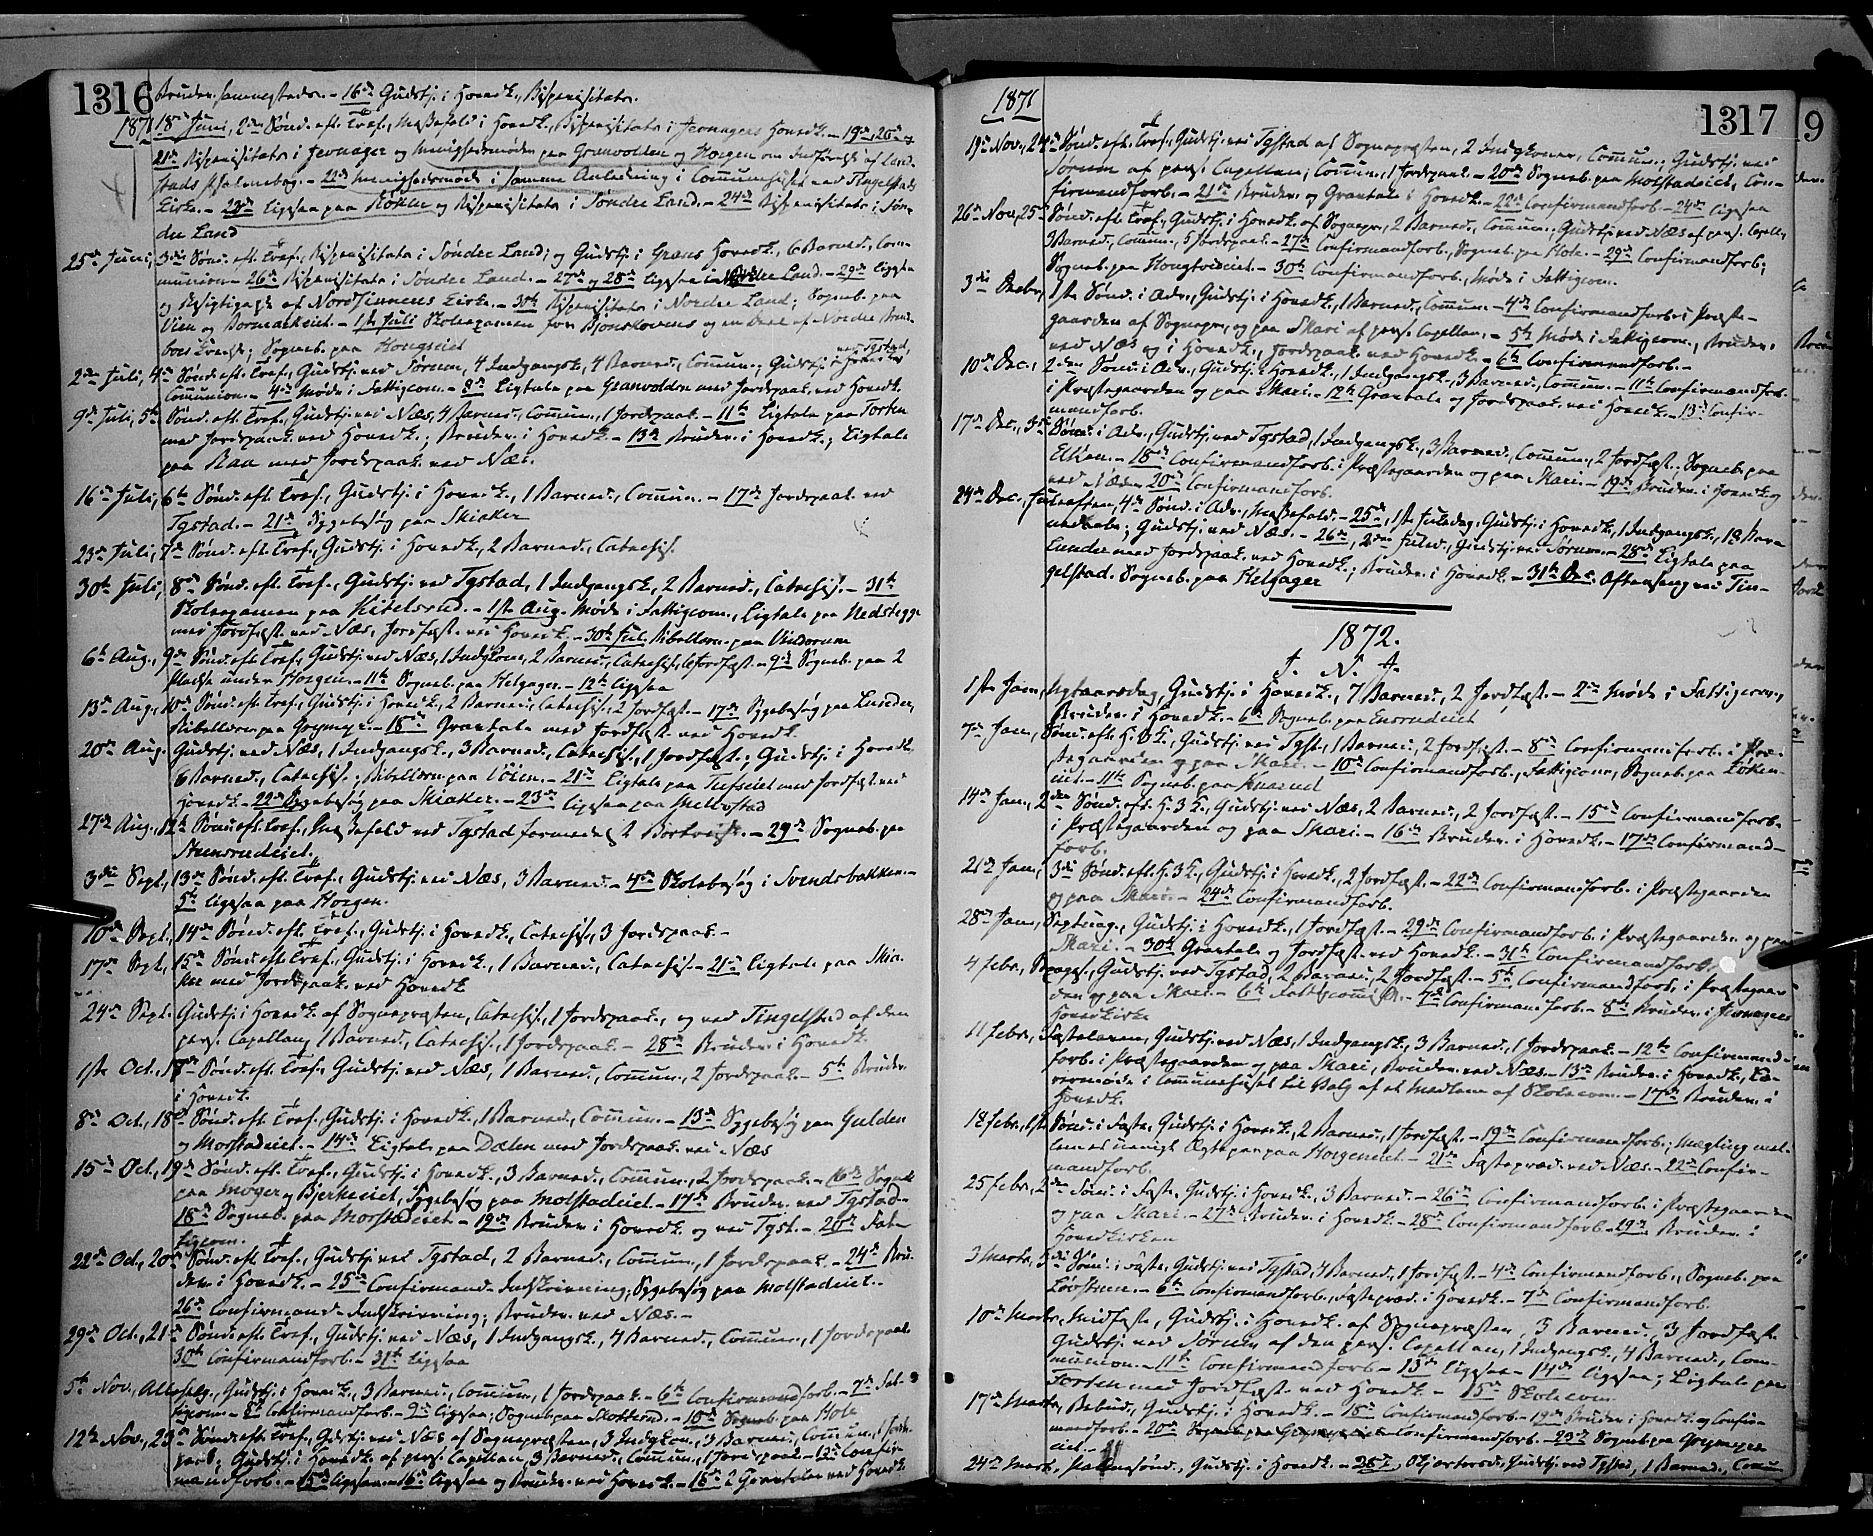 SAH, Gran prestekontor, Ministerialbok nr. 12, 1856-1874, s. 1316-1317